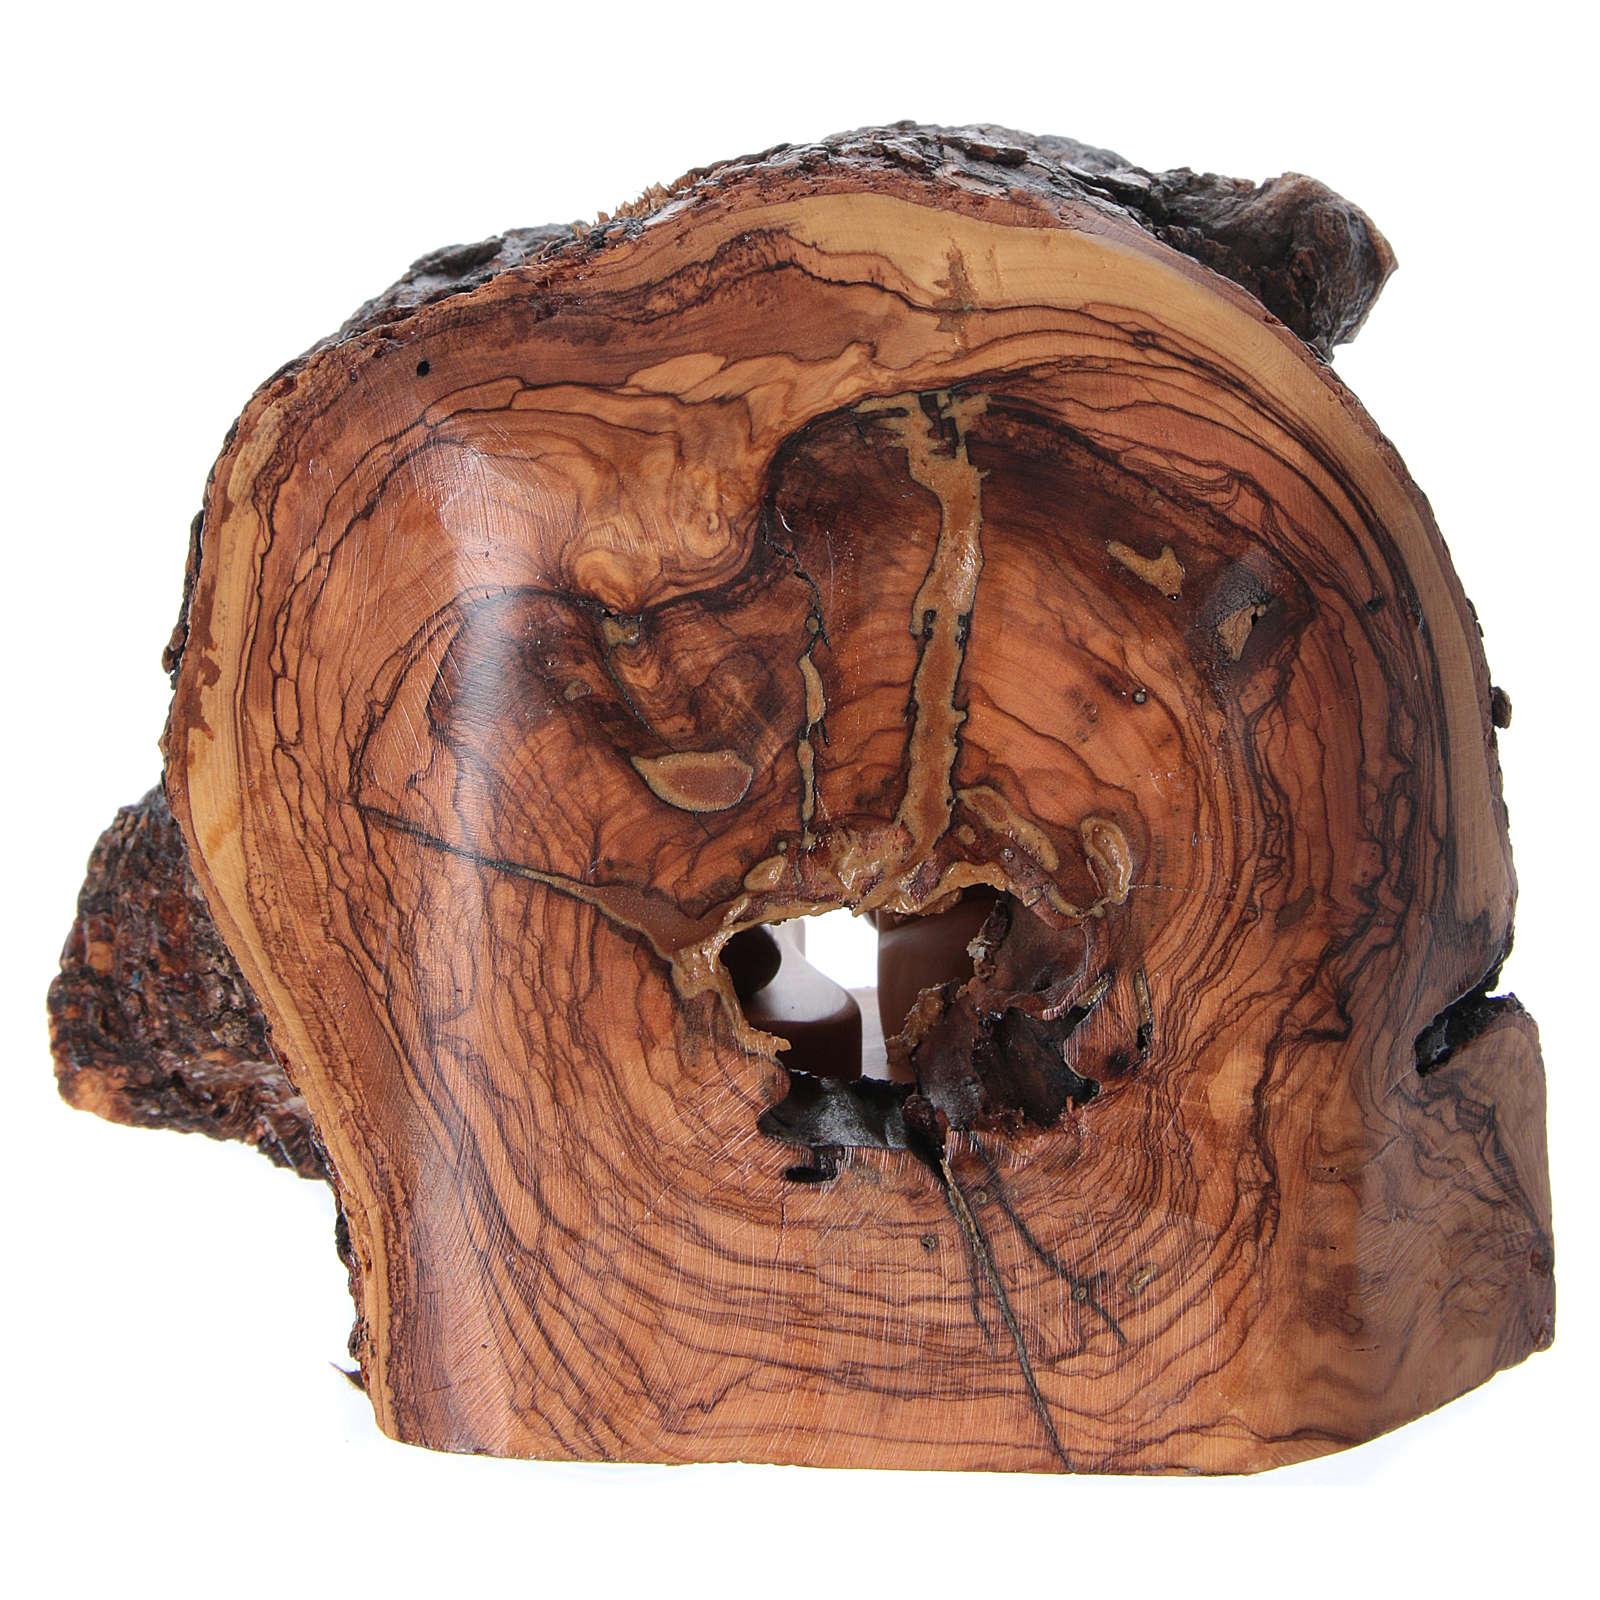 Natividad en cueva de madera de olivo de Belén 15x20x15 cm 4